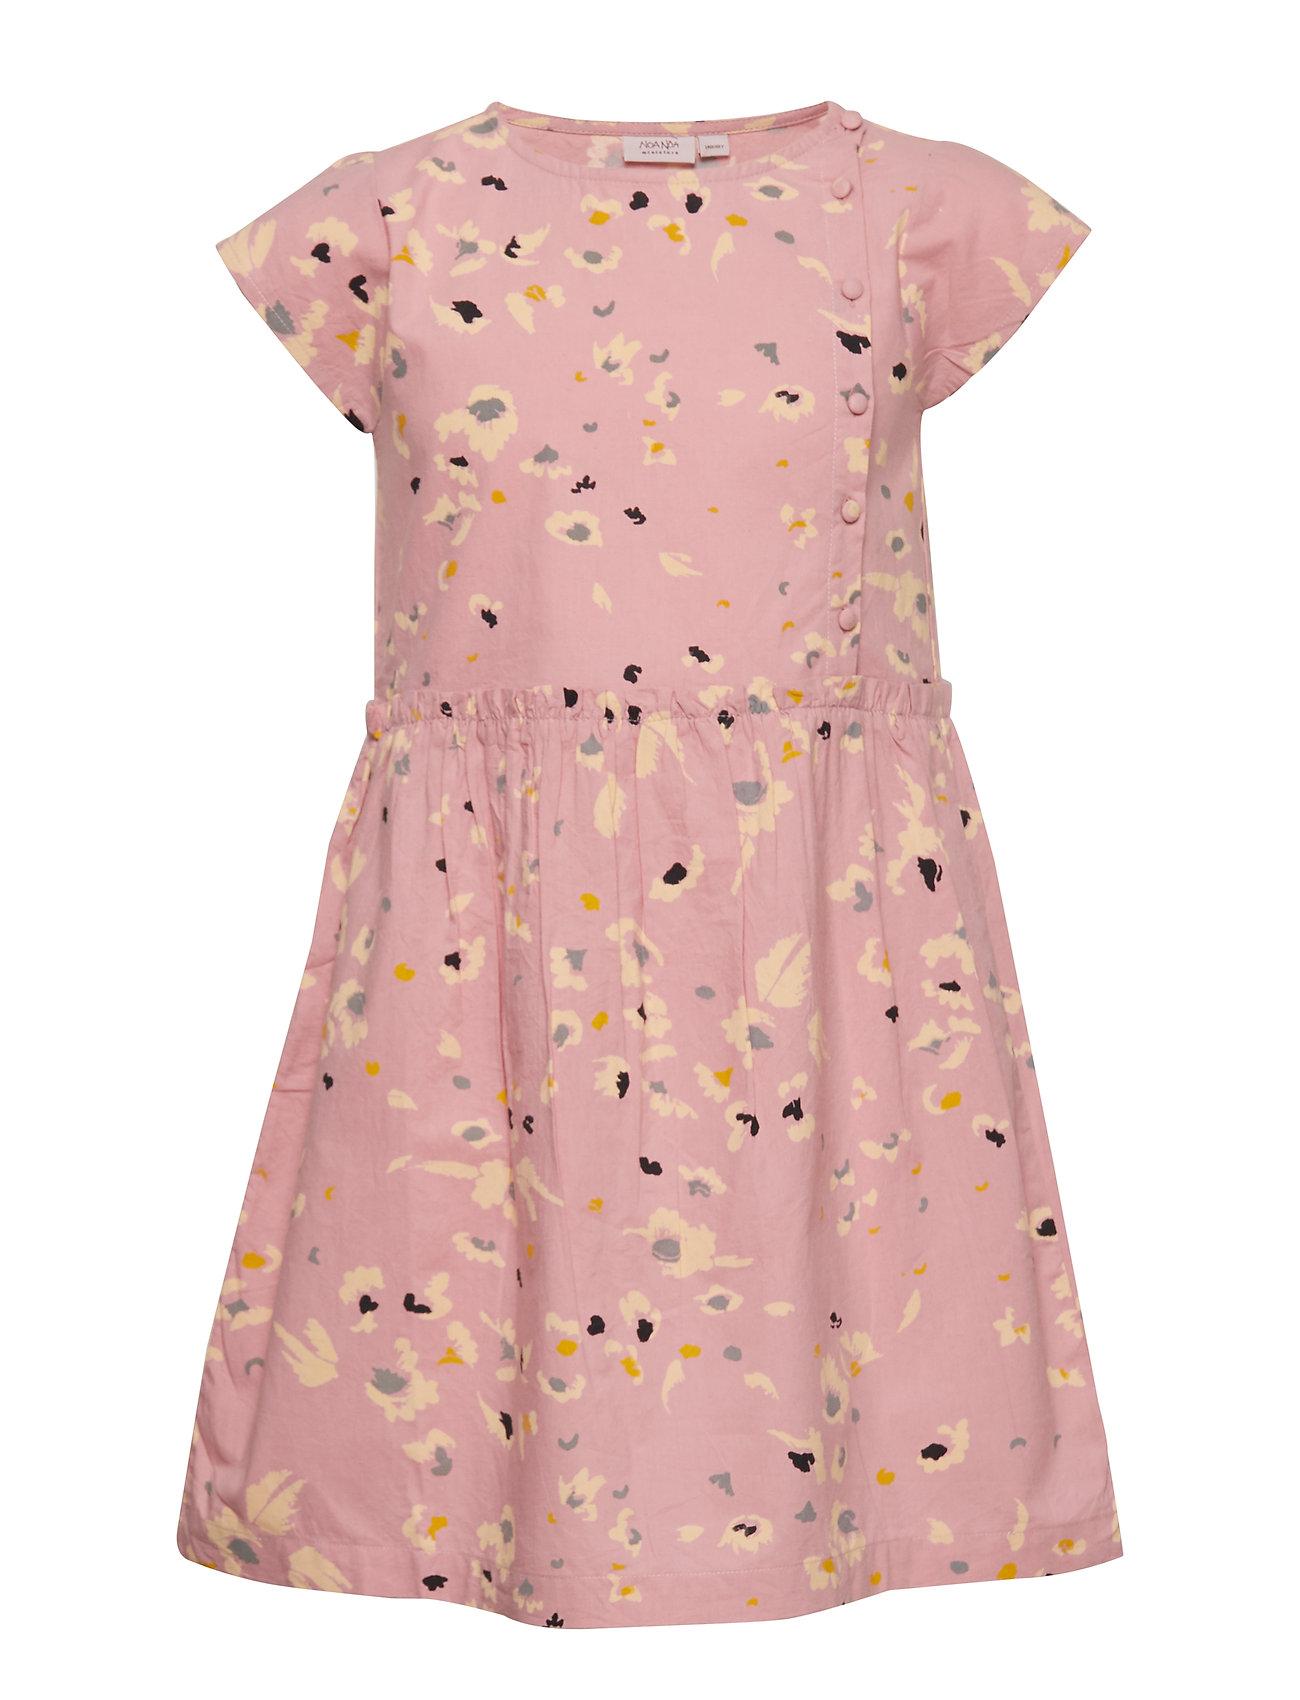 321837b64e4 Dress Short Sleeve (Rose Tan) (262.50 kr) - Noa Noa Miniature ...